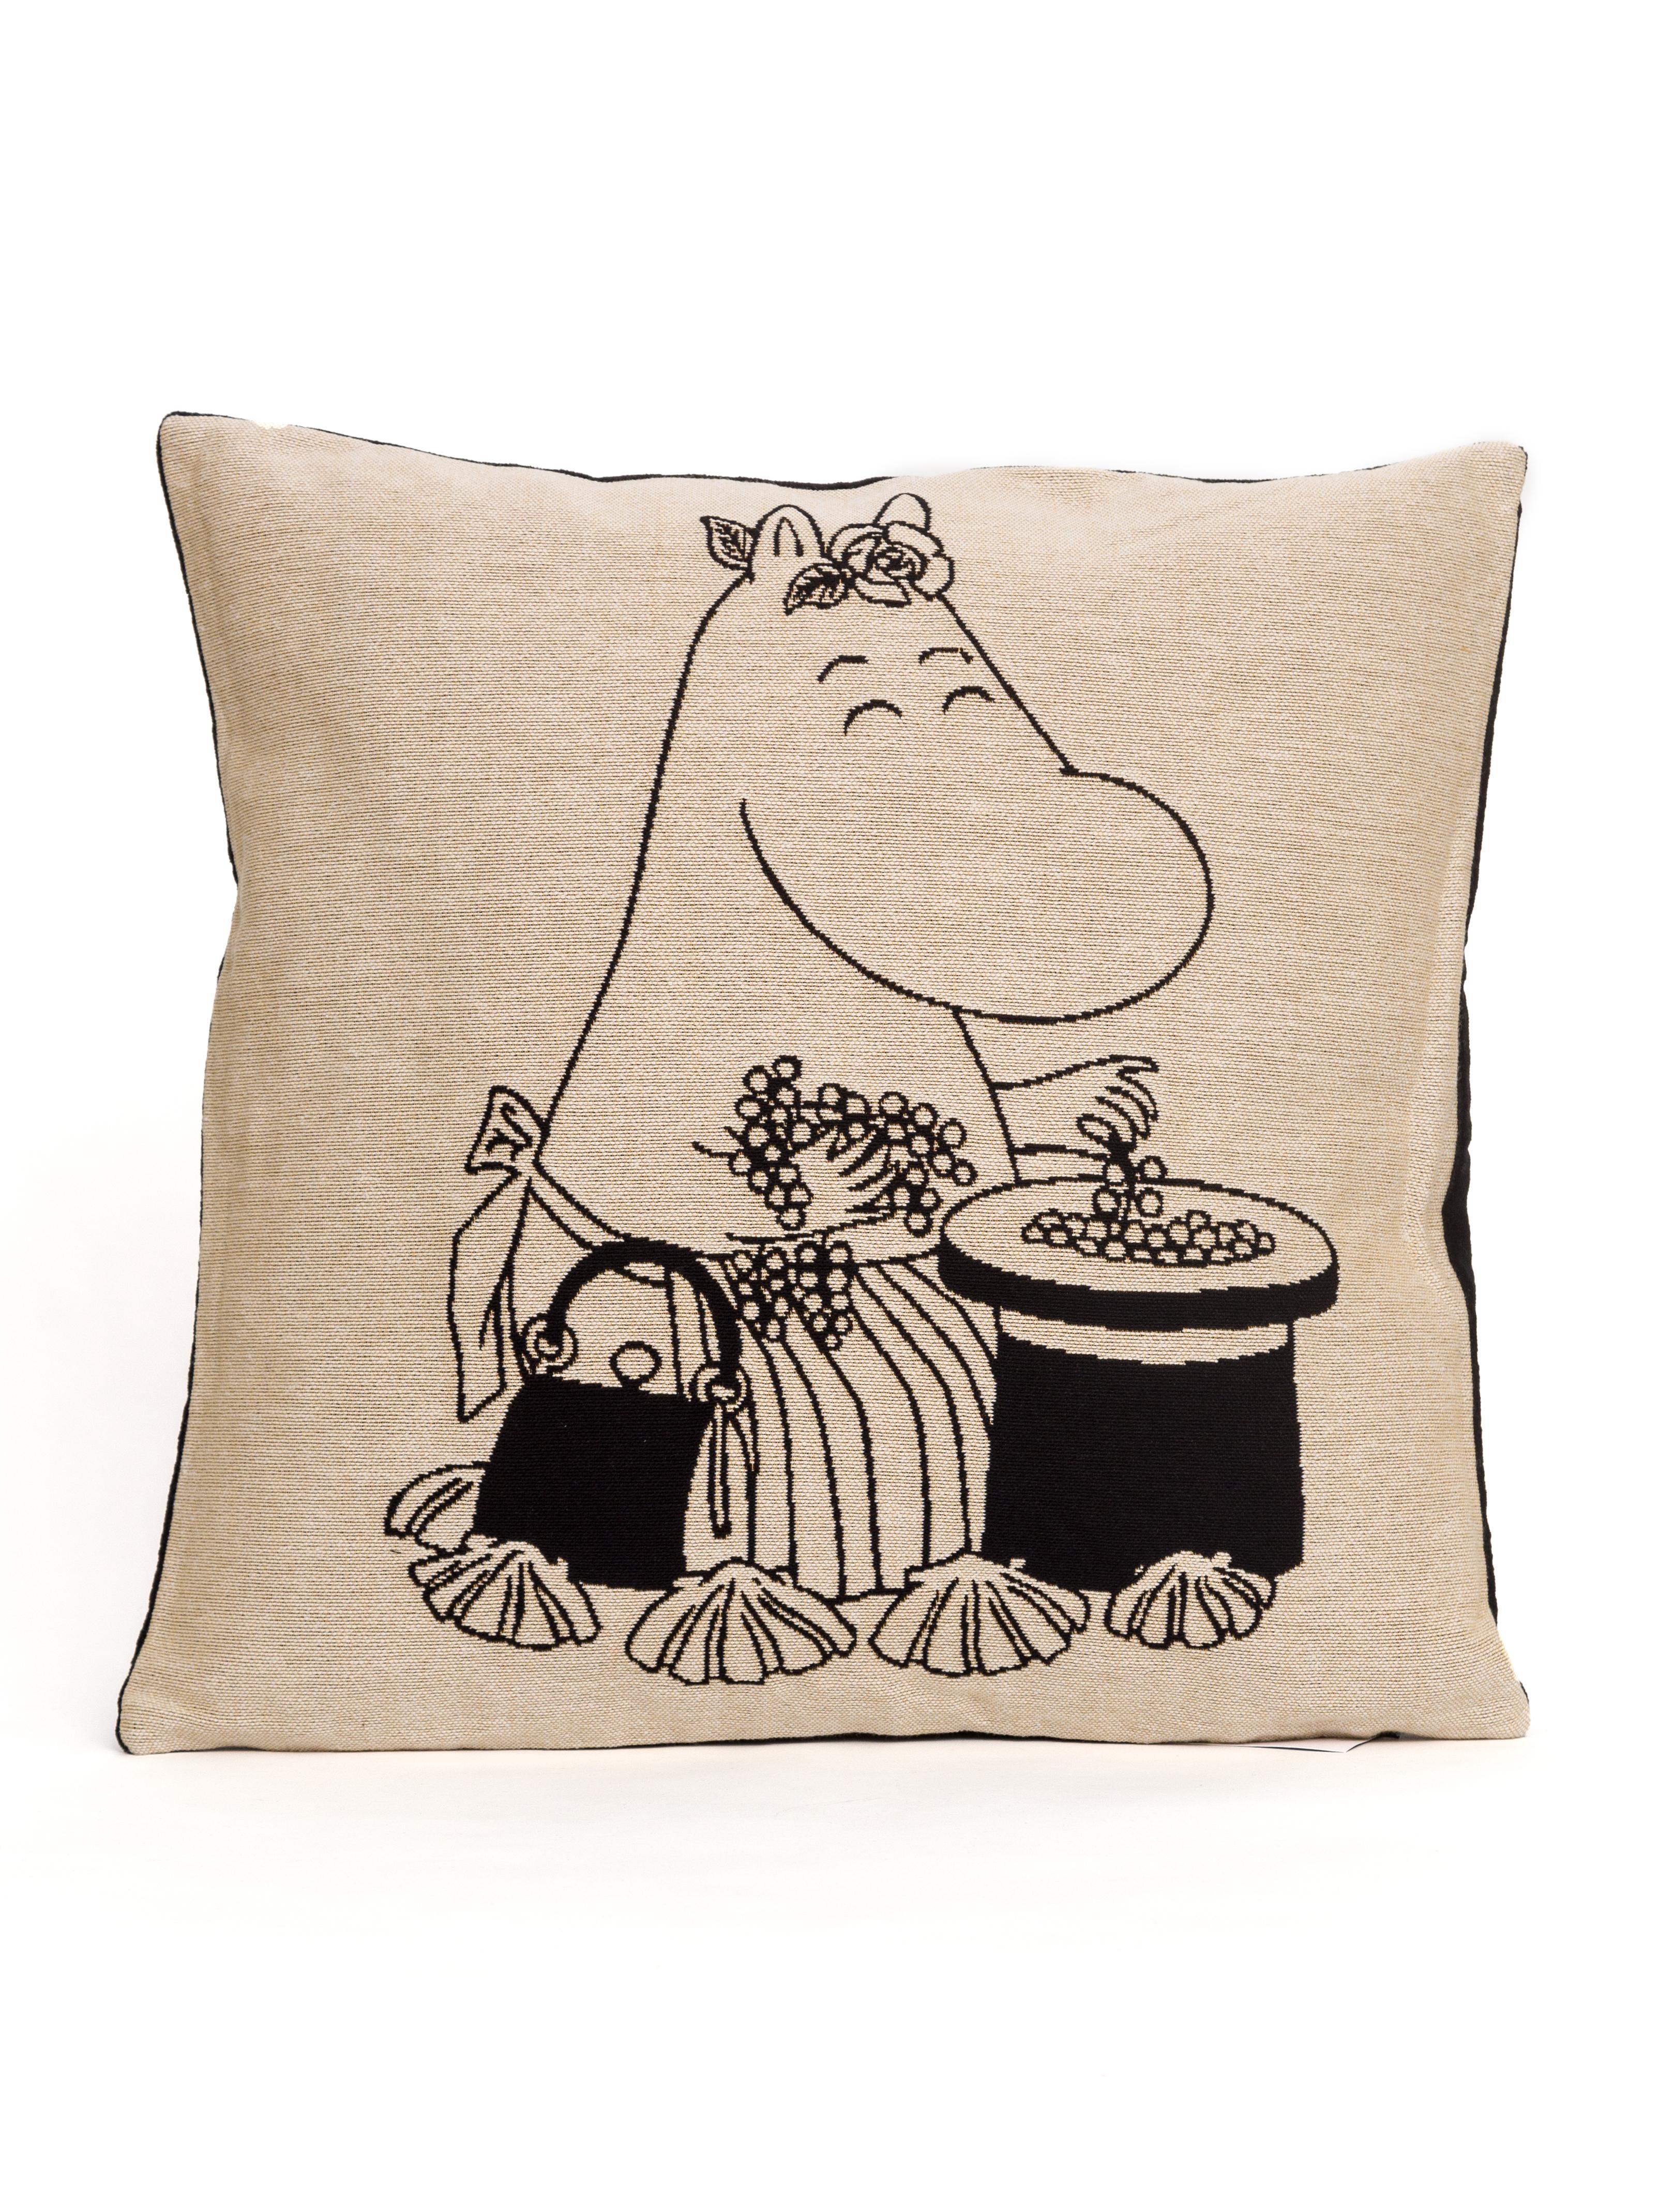 Aurora Decorari Moomin Gobelin Cushion Cover Moominmamma 008CH